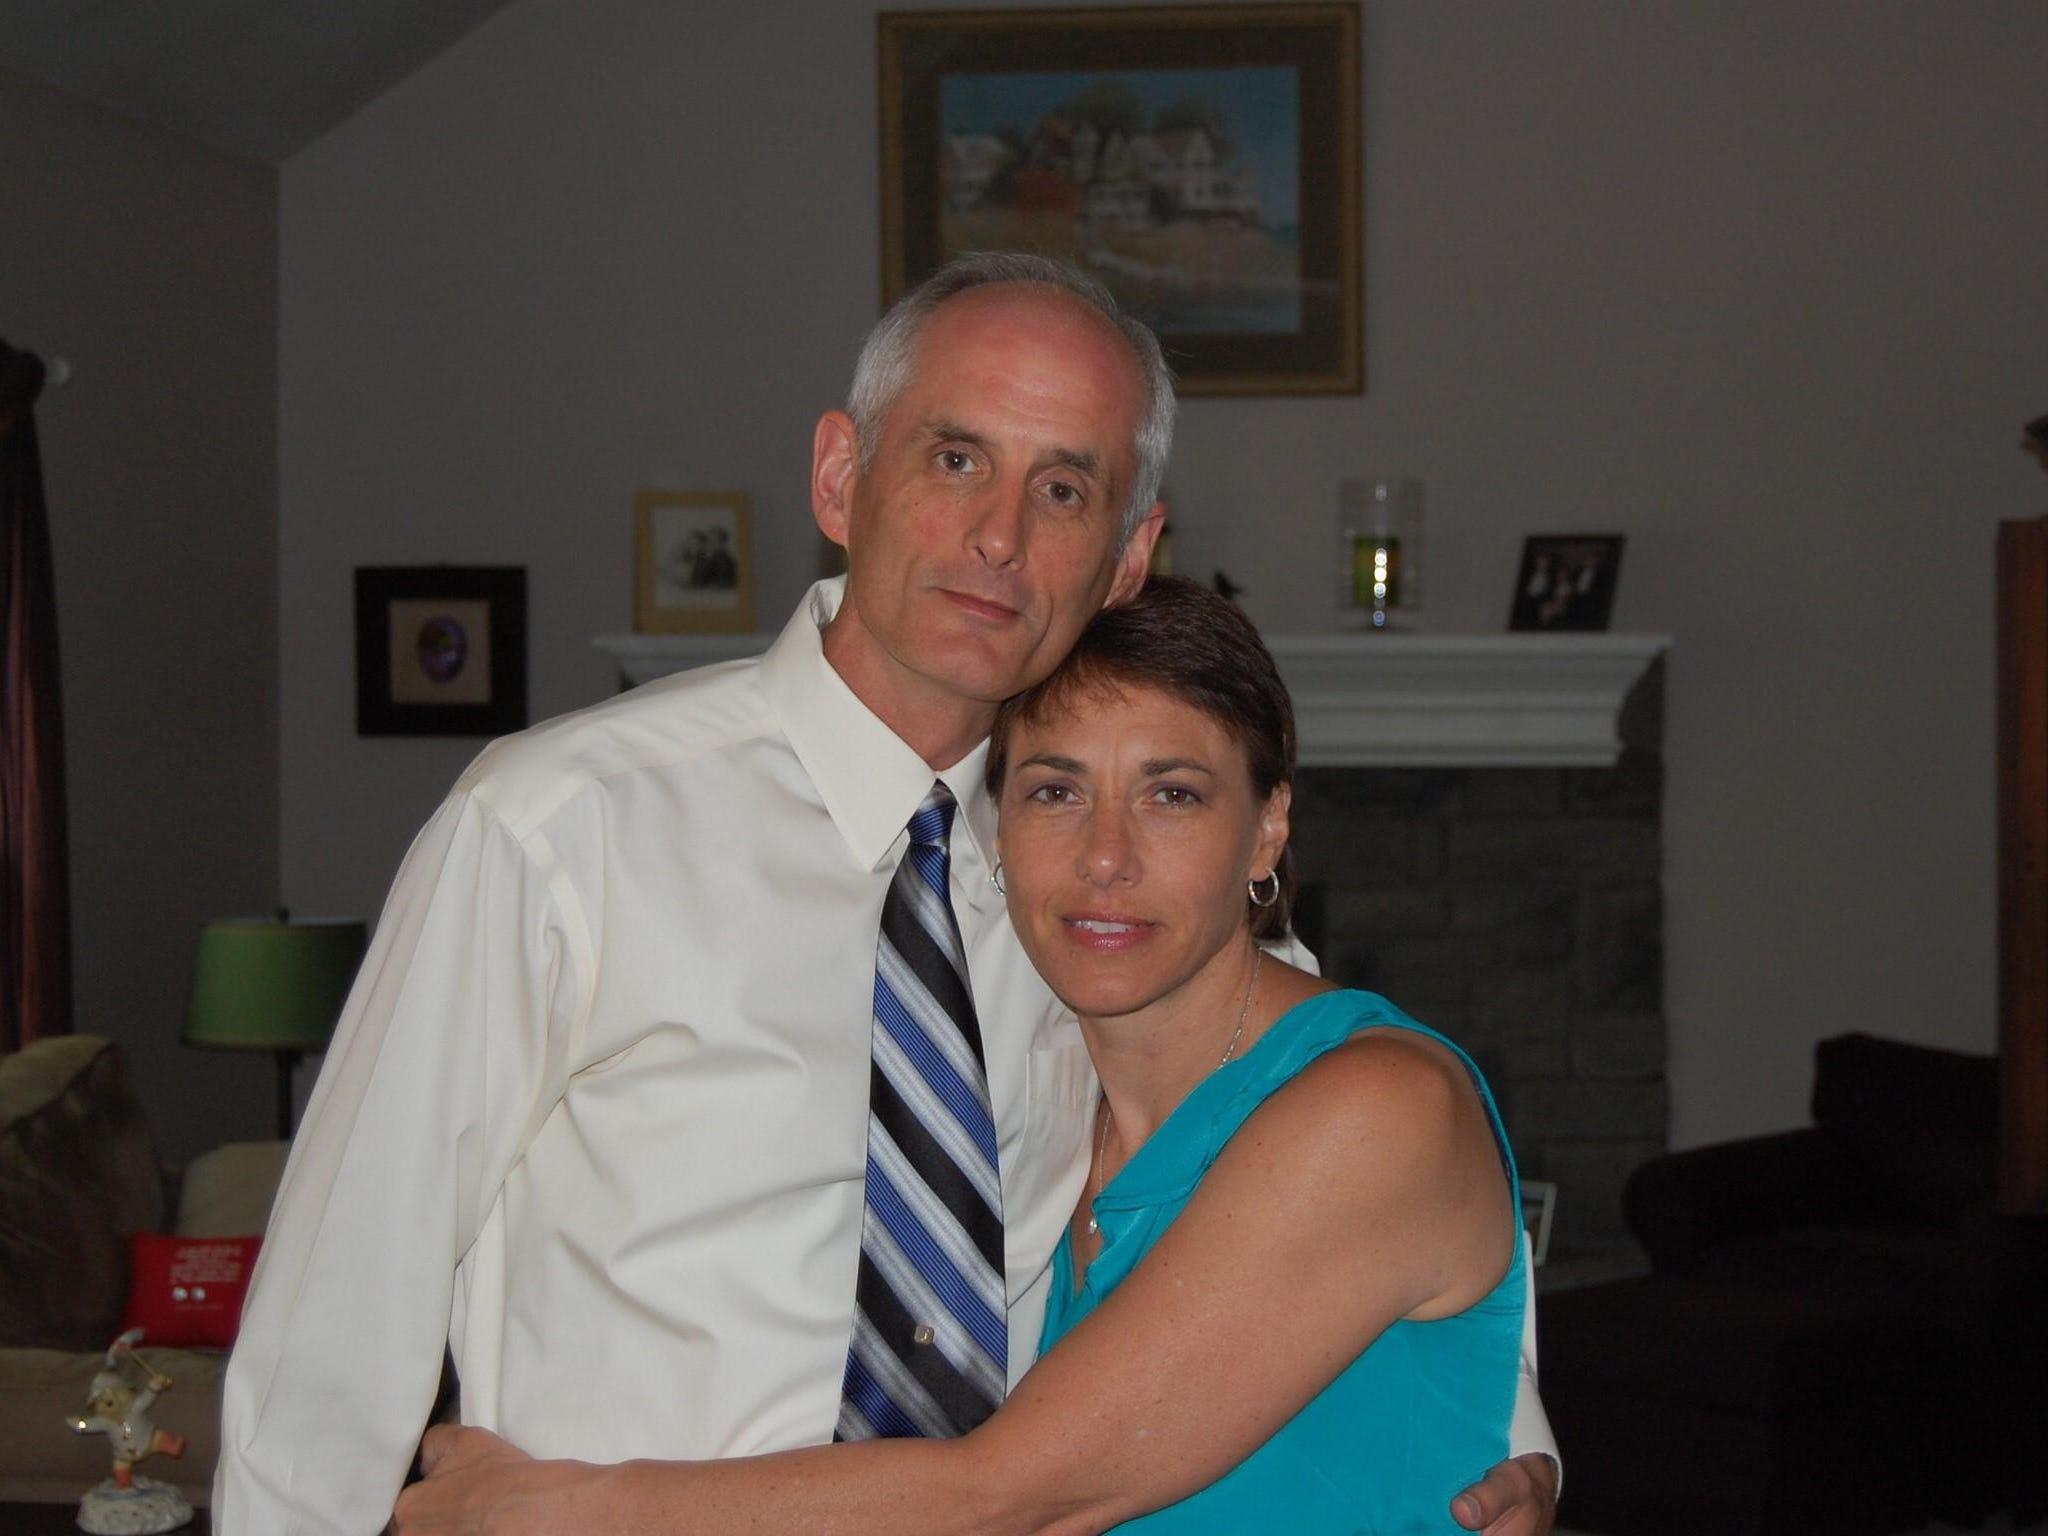 Elder swim coach John Book joins his wife, Kari.